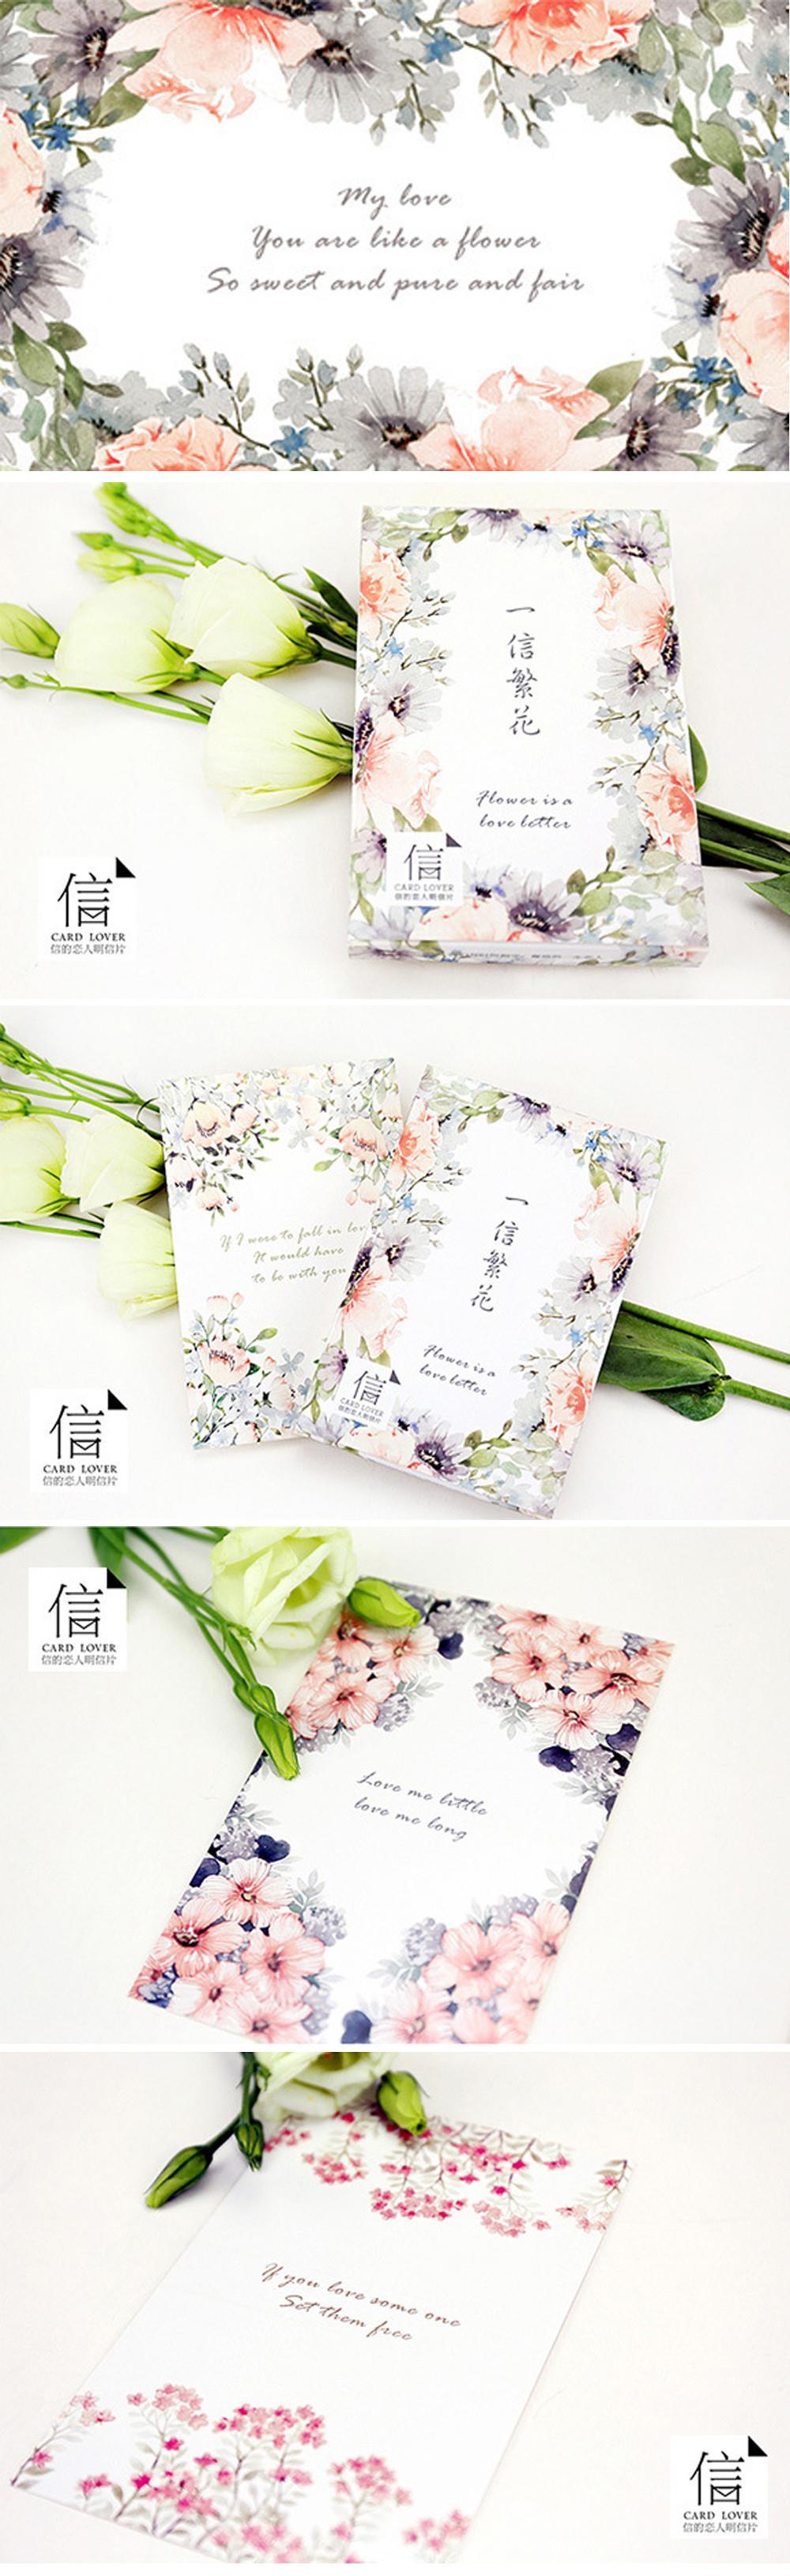 English Love Letter Flower Postcard Greeting Card Christmas Card